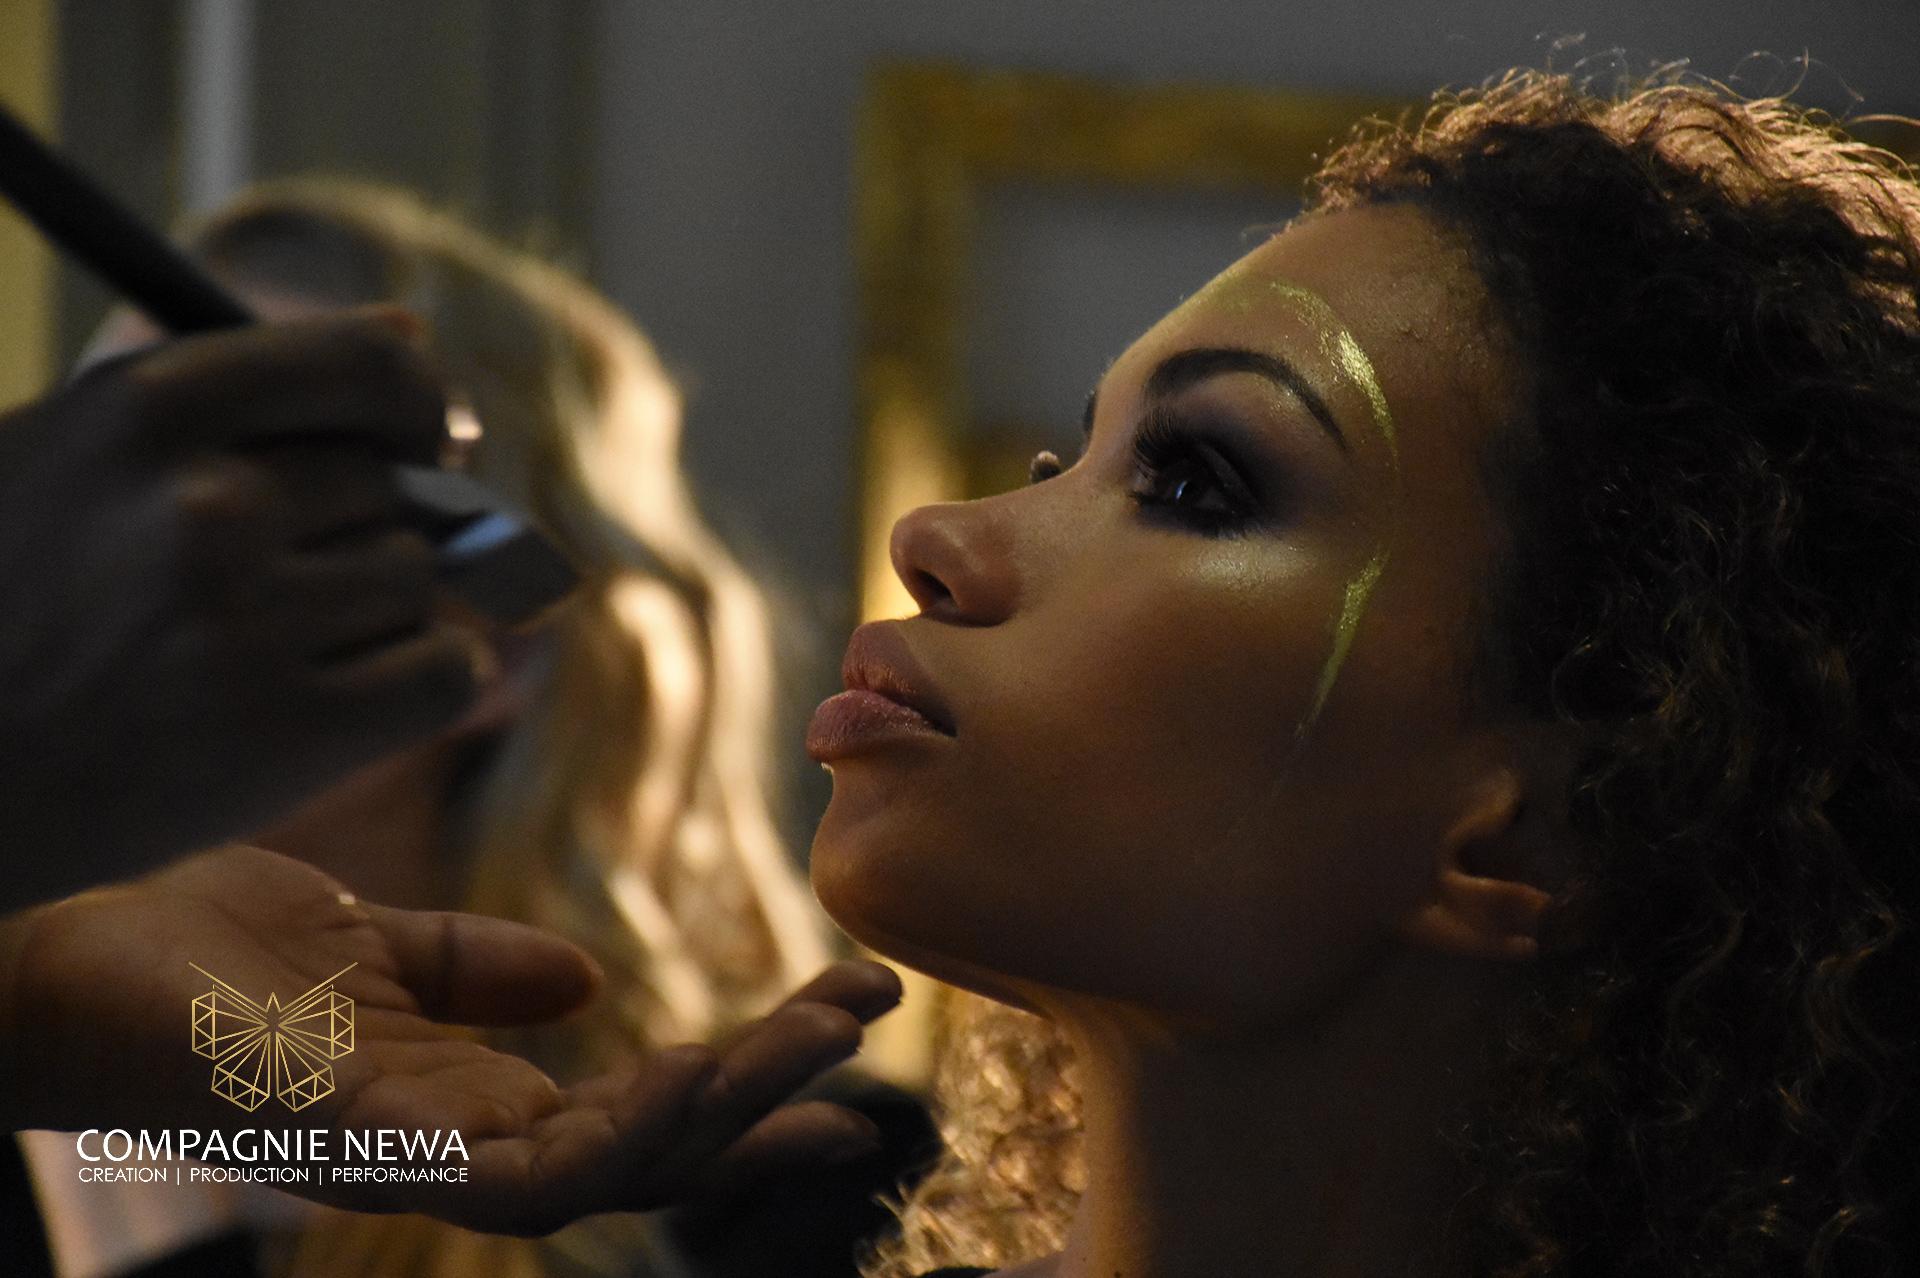 compagnie_newa_makeup_grime_belgie_nederland